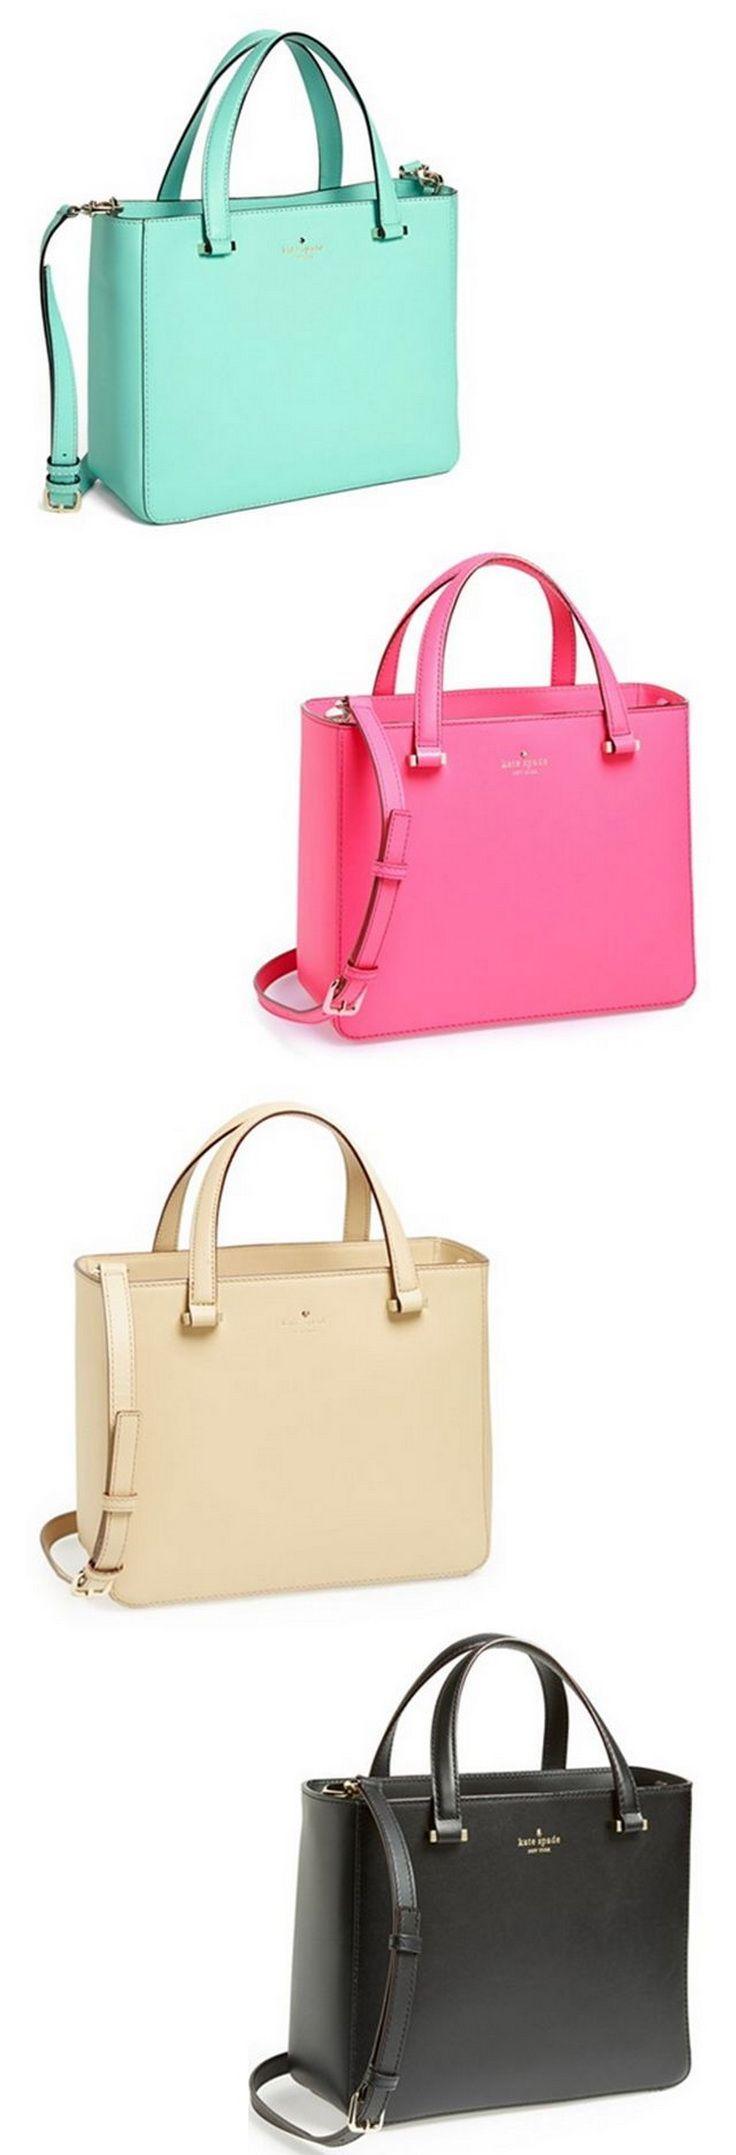 designer handbags outlet,Kate Spade Purse #Kate #Spade #Purse